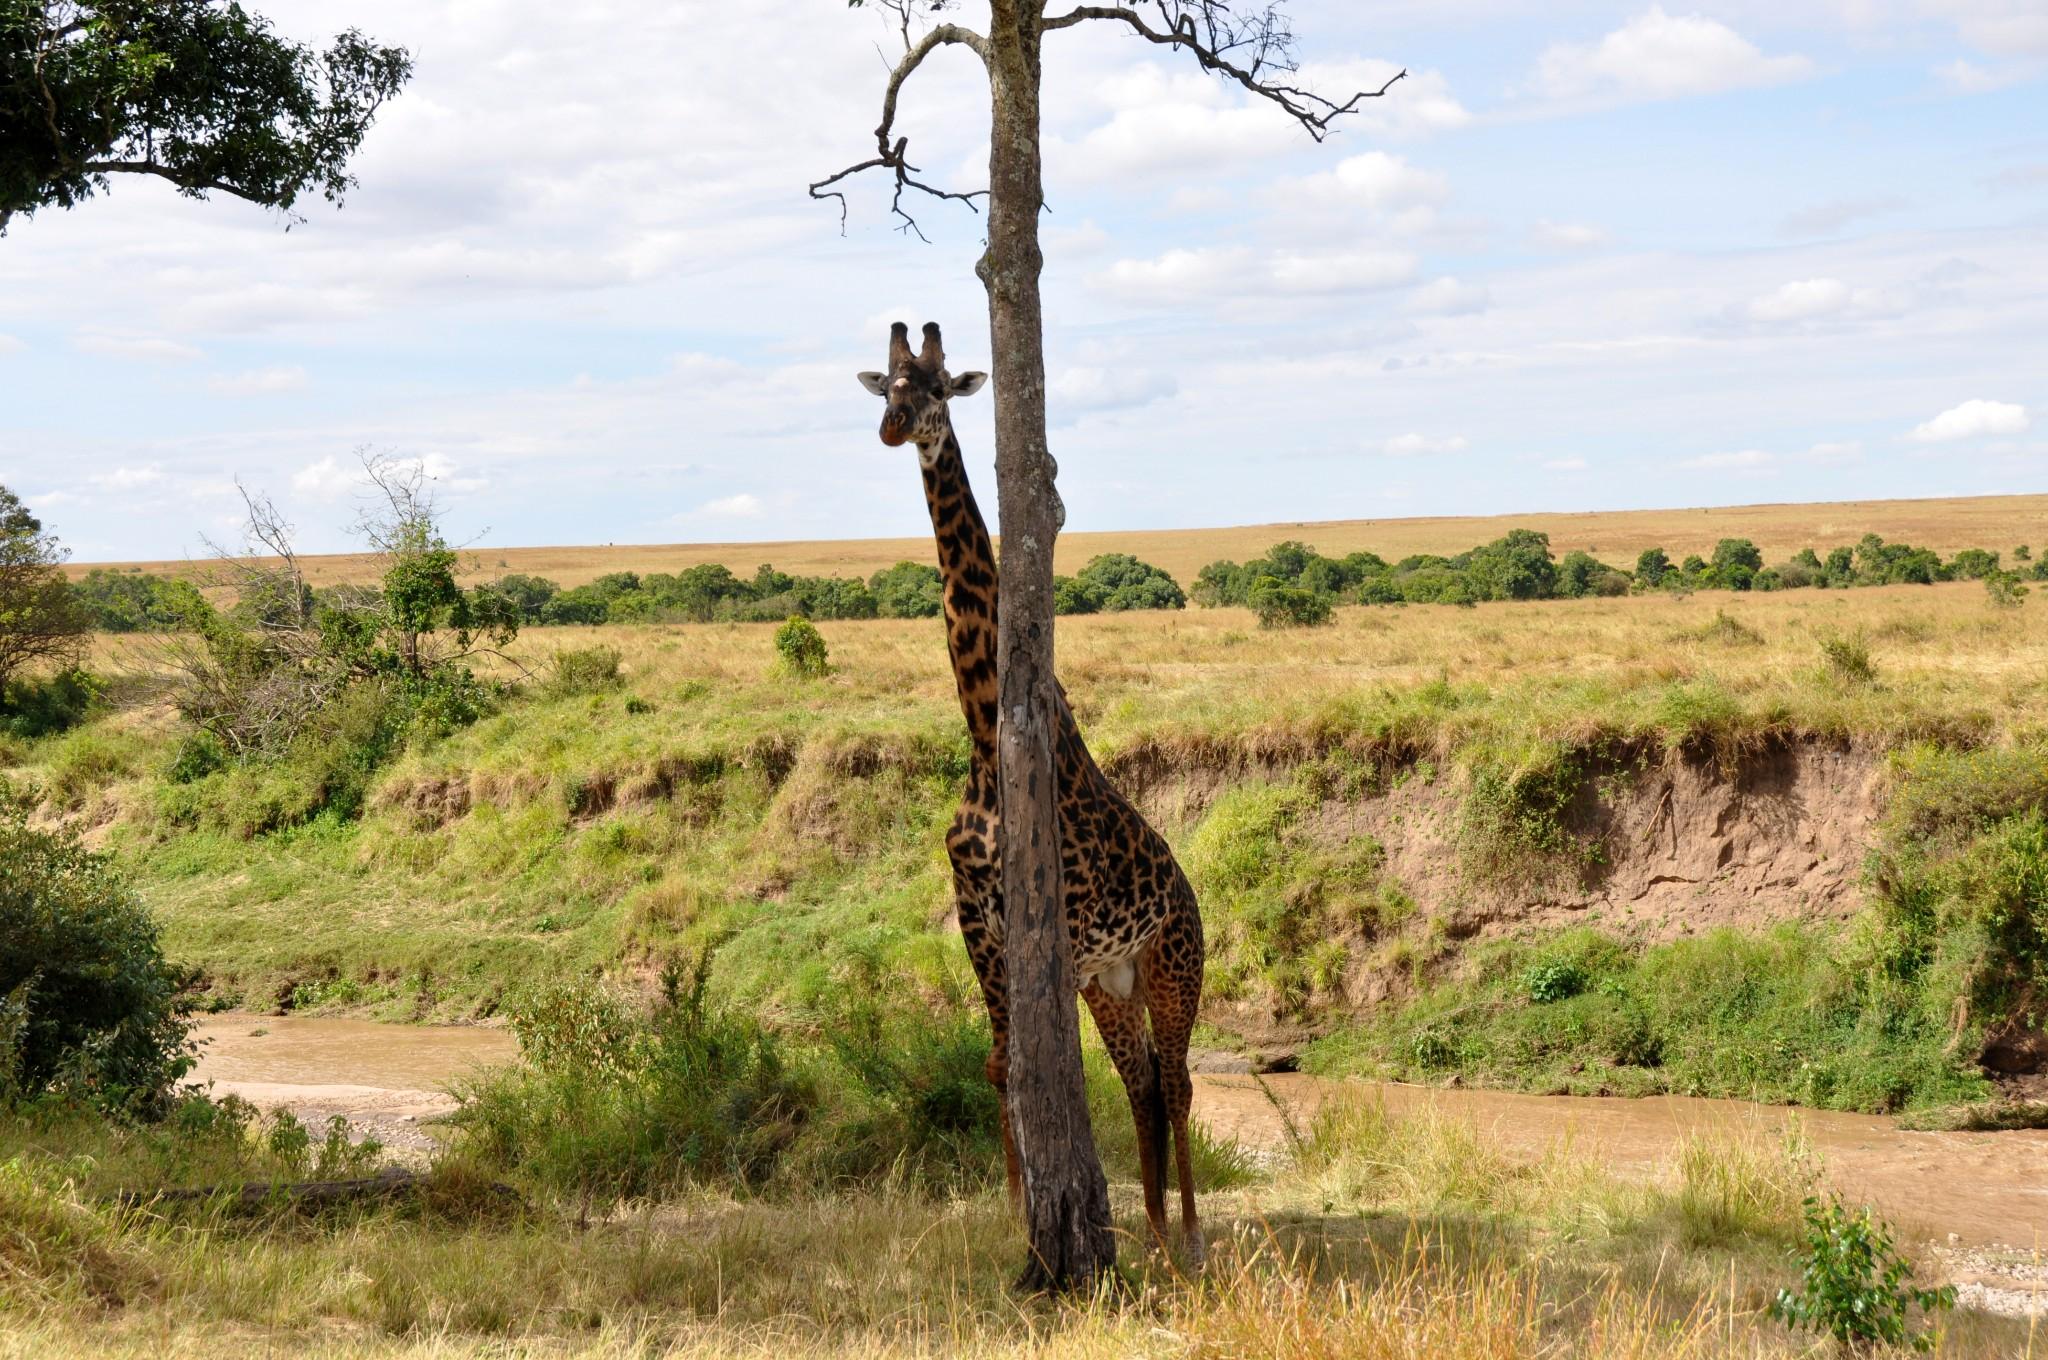 GIraffe at Maasai Mara National Park